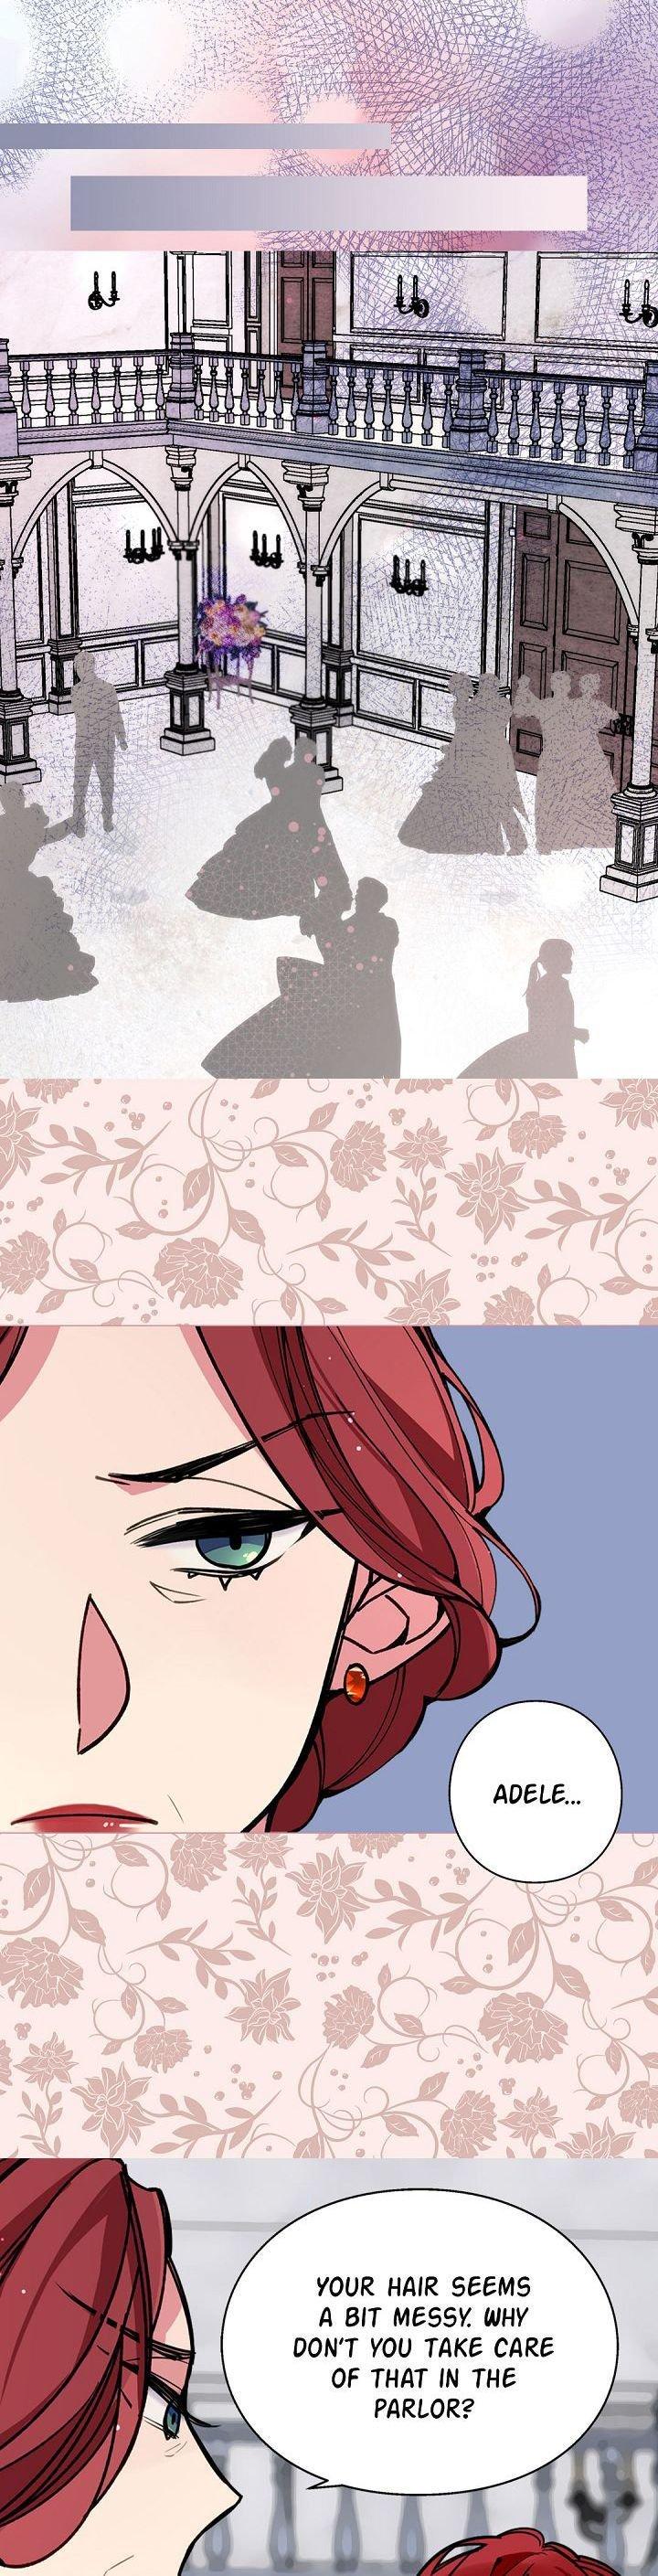 Manga La Dolce Vita Di Adelaide - Chapter 7 Page 1